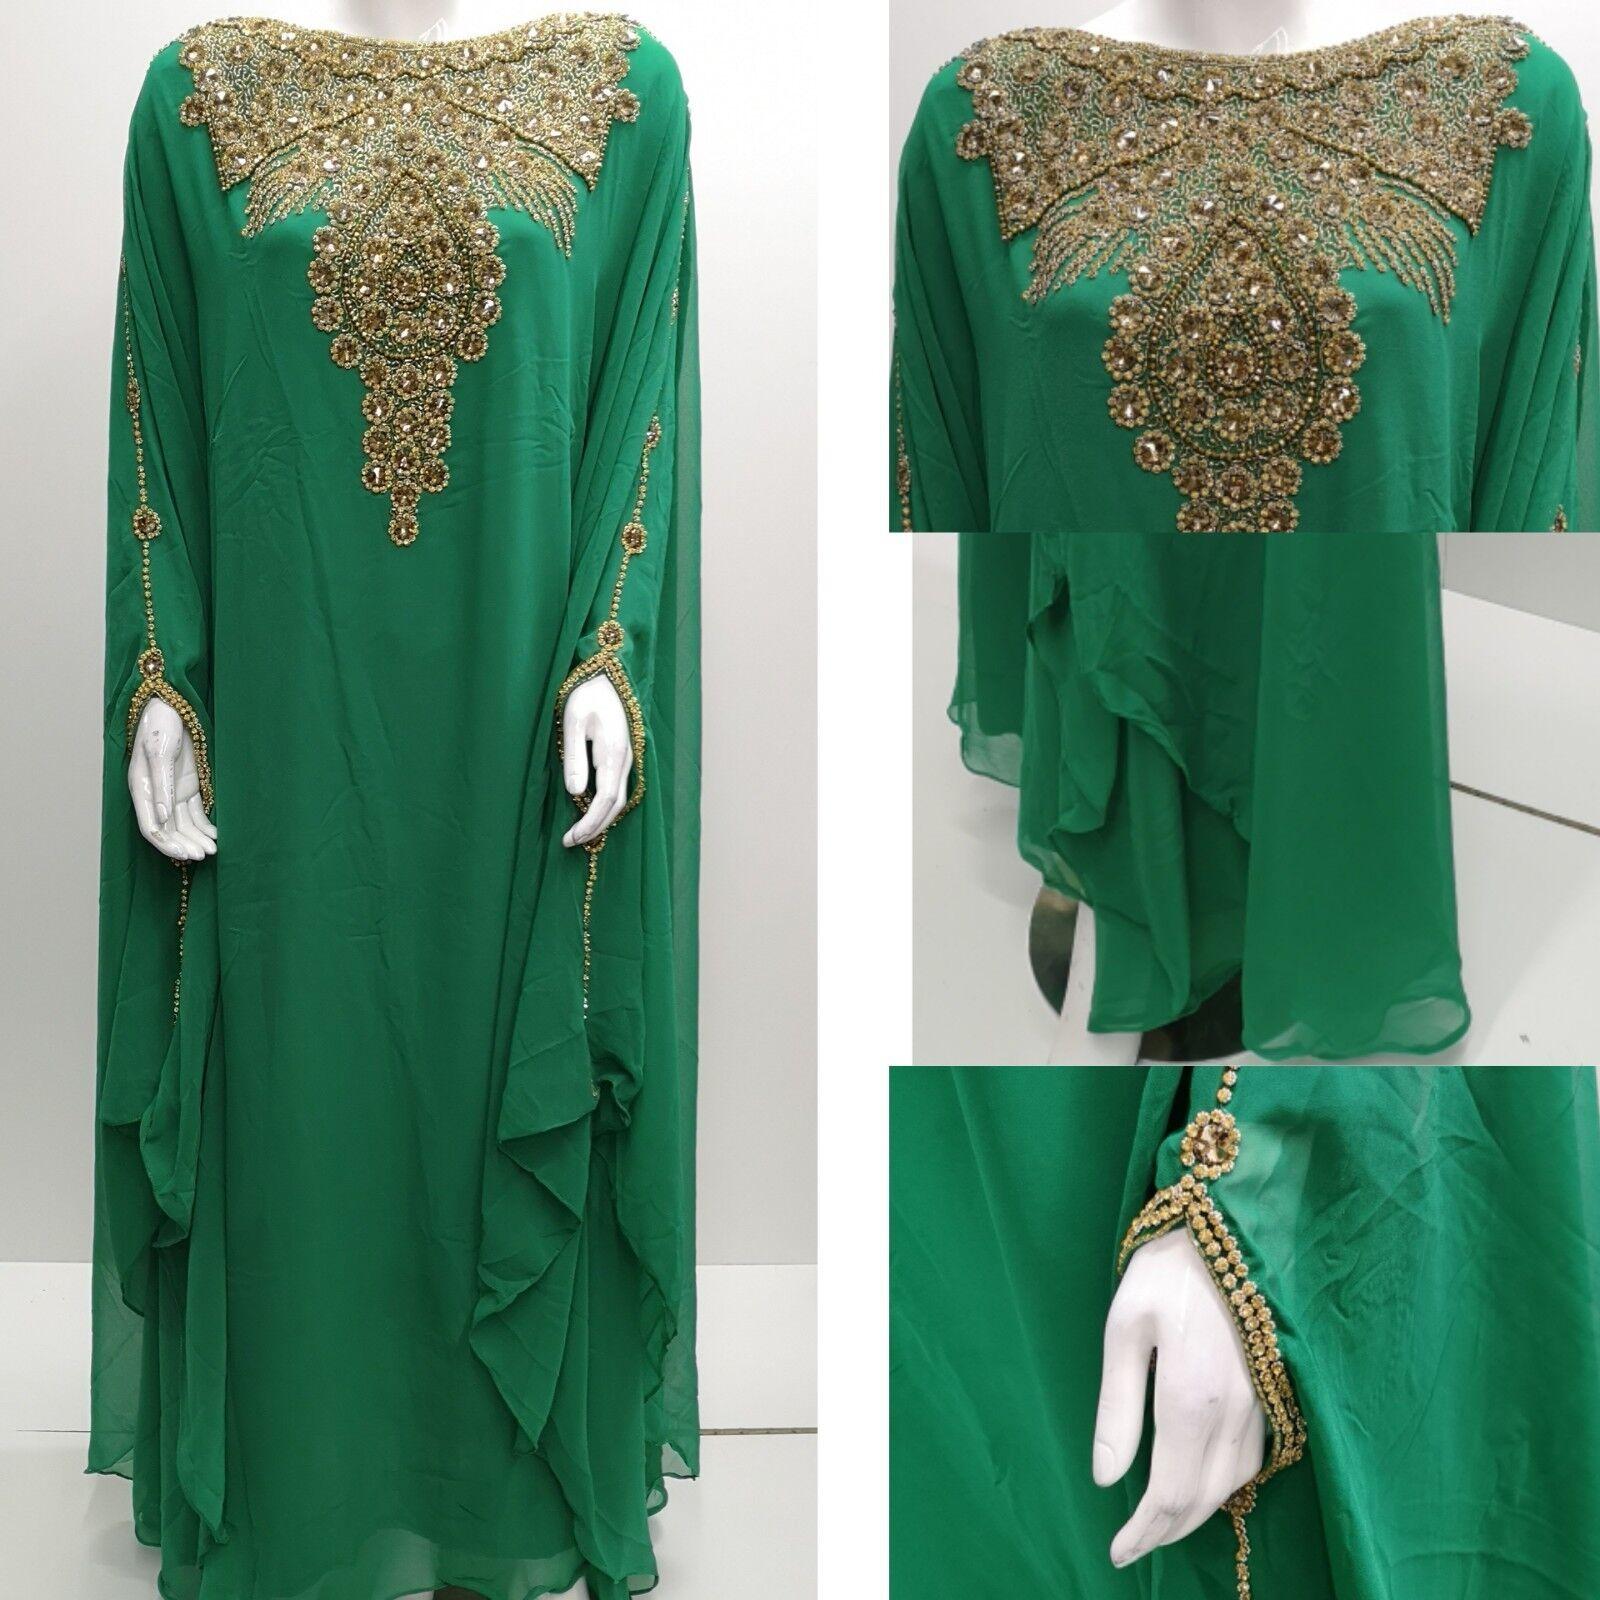 Dubai farasha .maxi dress.khaliji farasha.party dresses.one dresses.one dresses.one size fits all.new 4df78c